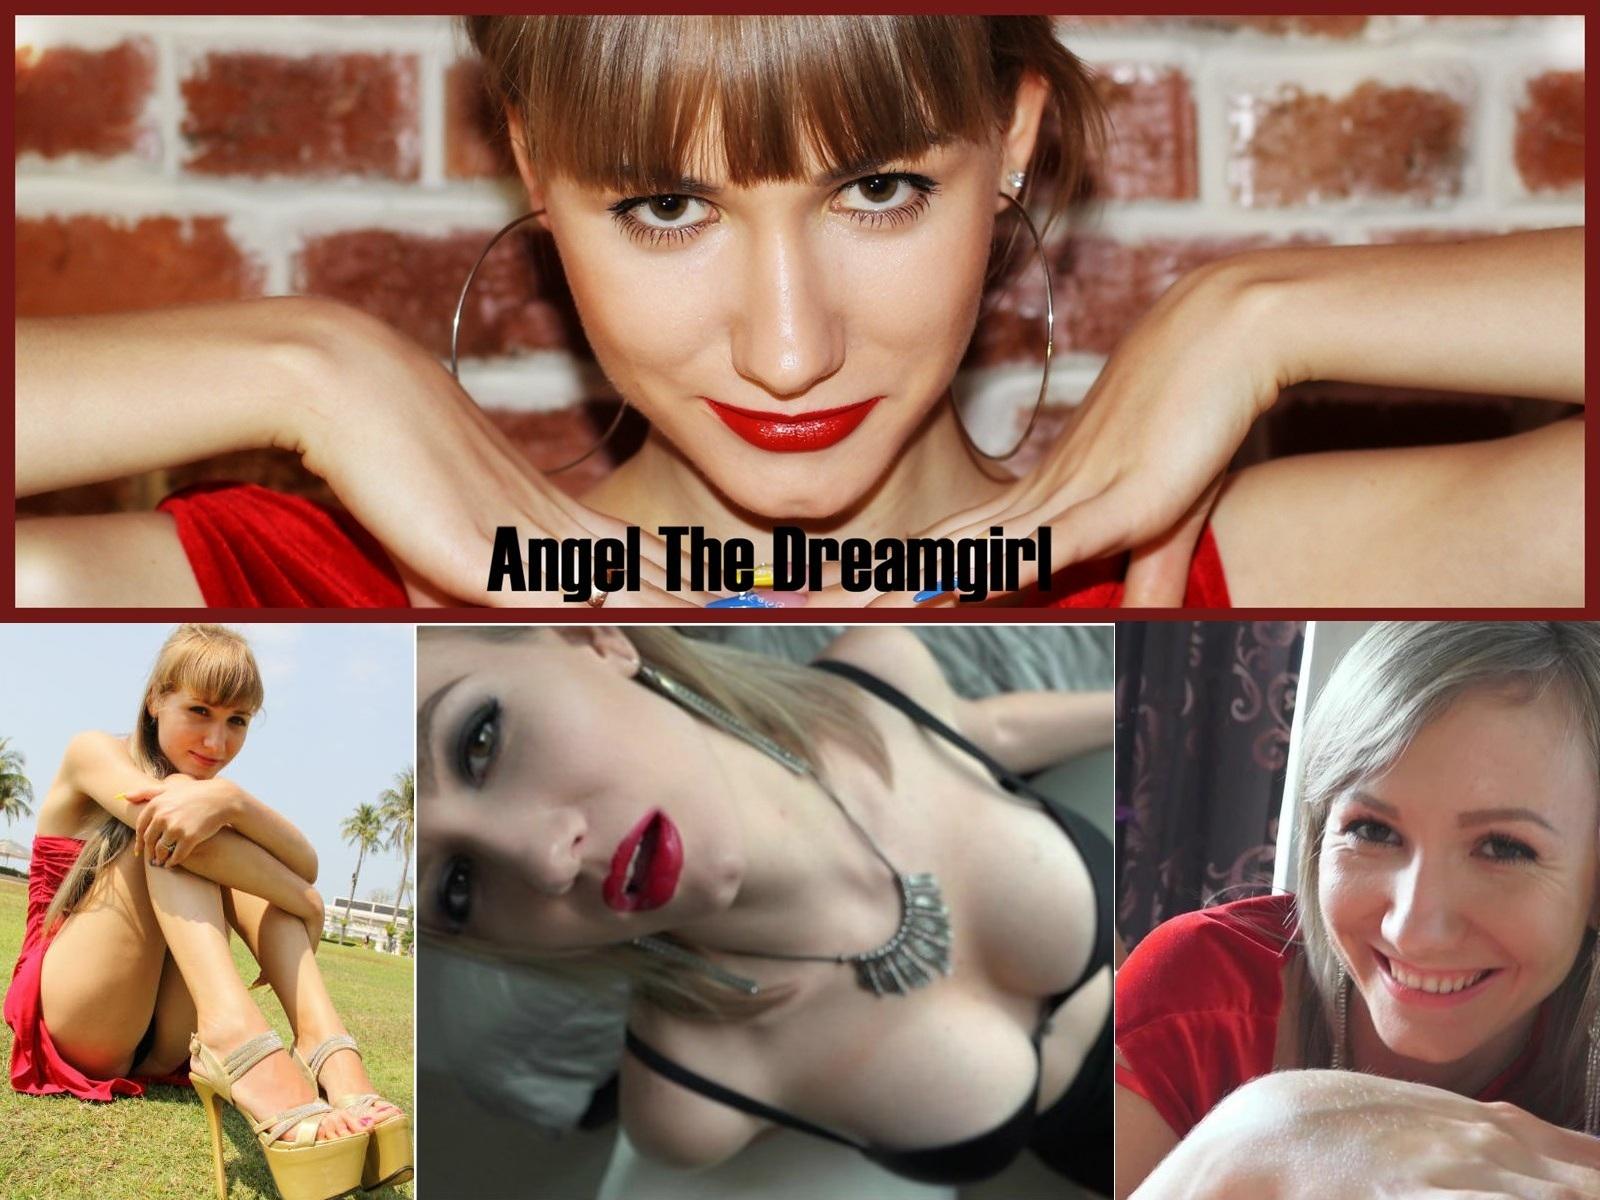 [Angel The Dreamgirl / Clips4Sale.com] SITERIP (Angel-Desert/KatiesClub C4S) (197 HD)